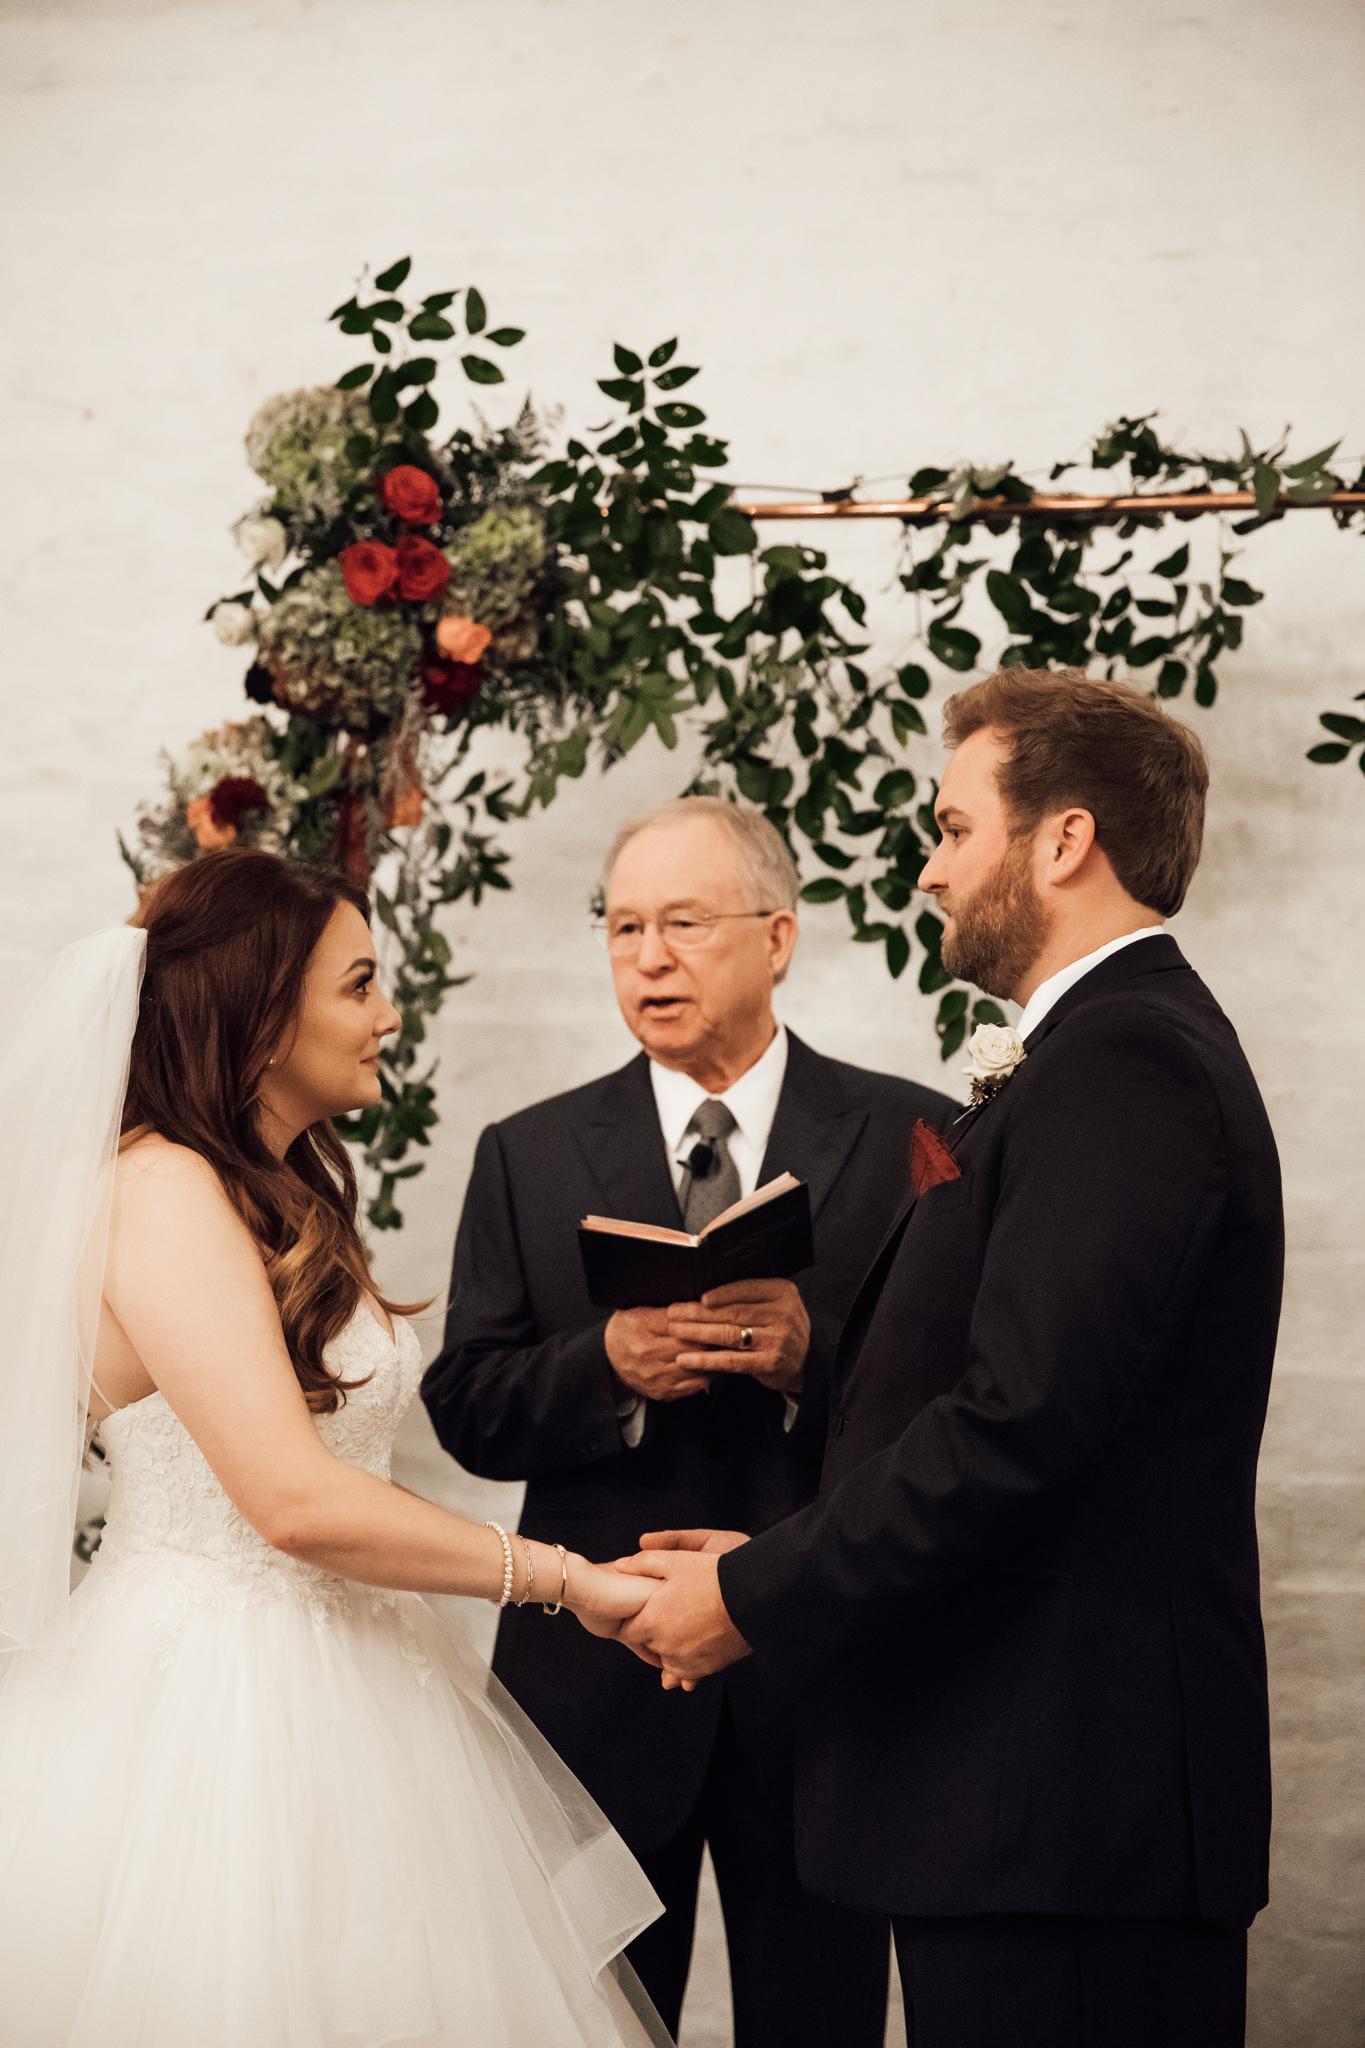 memphis-wedding-photographers-thewarmtharoundyou-ballinese-ballroom (146 of 232).jpg